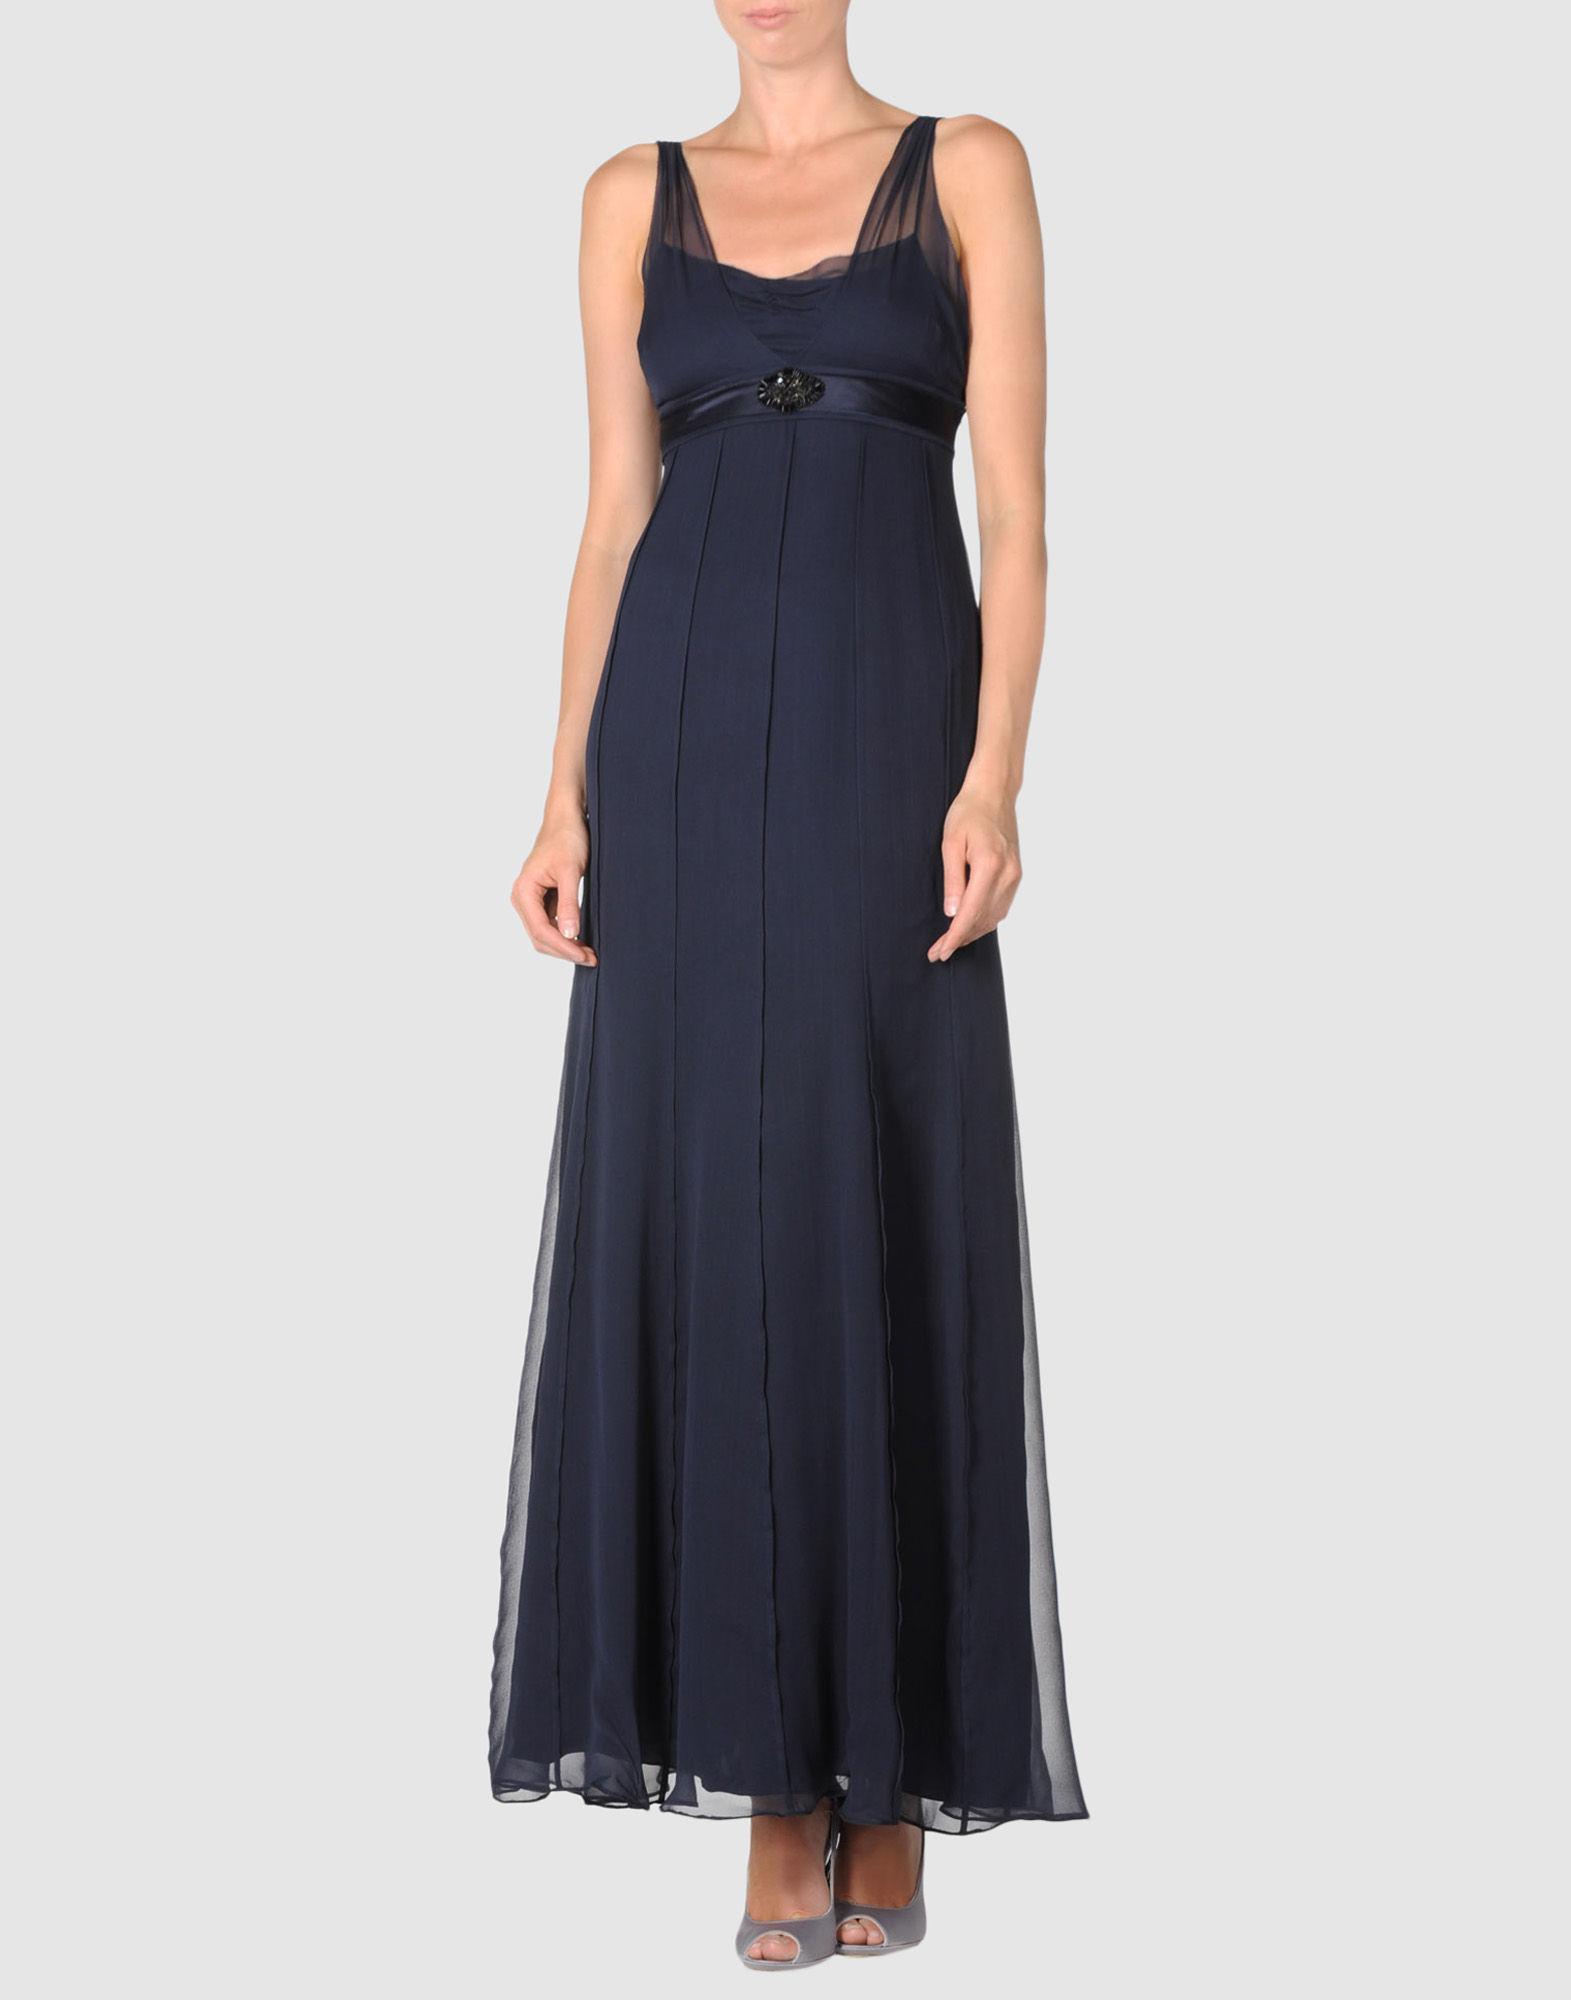 34177540VG 14 f - Evening Φορεματα Vera Wang 2011 2012 Κωδ.02